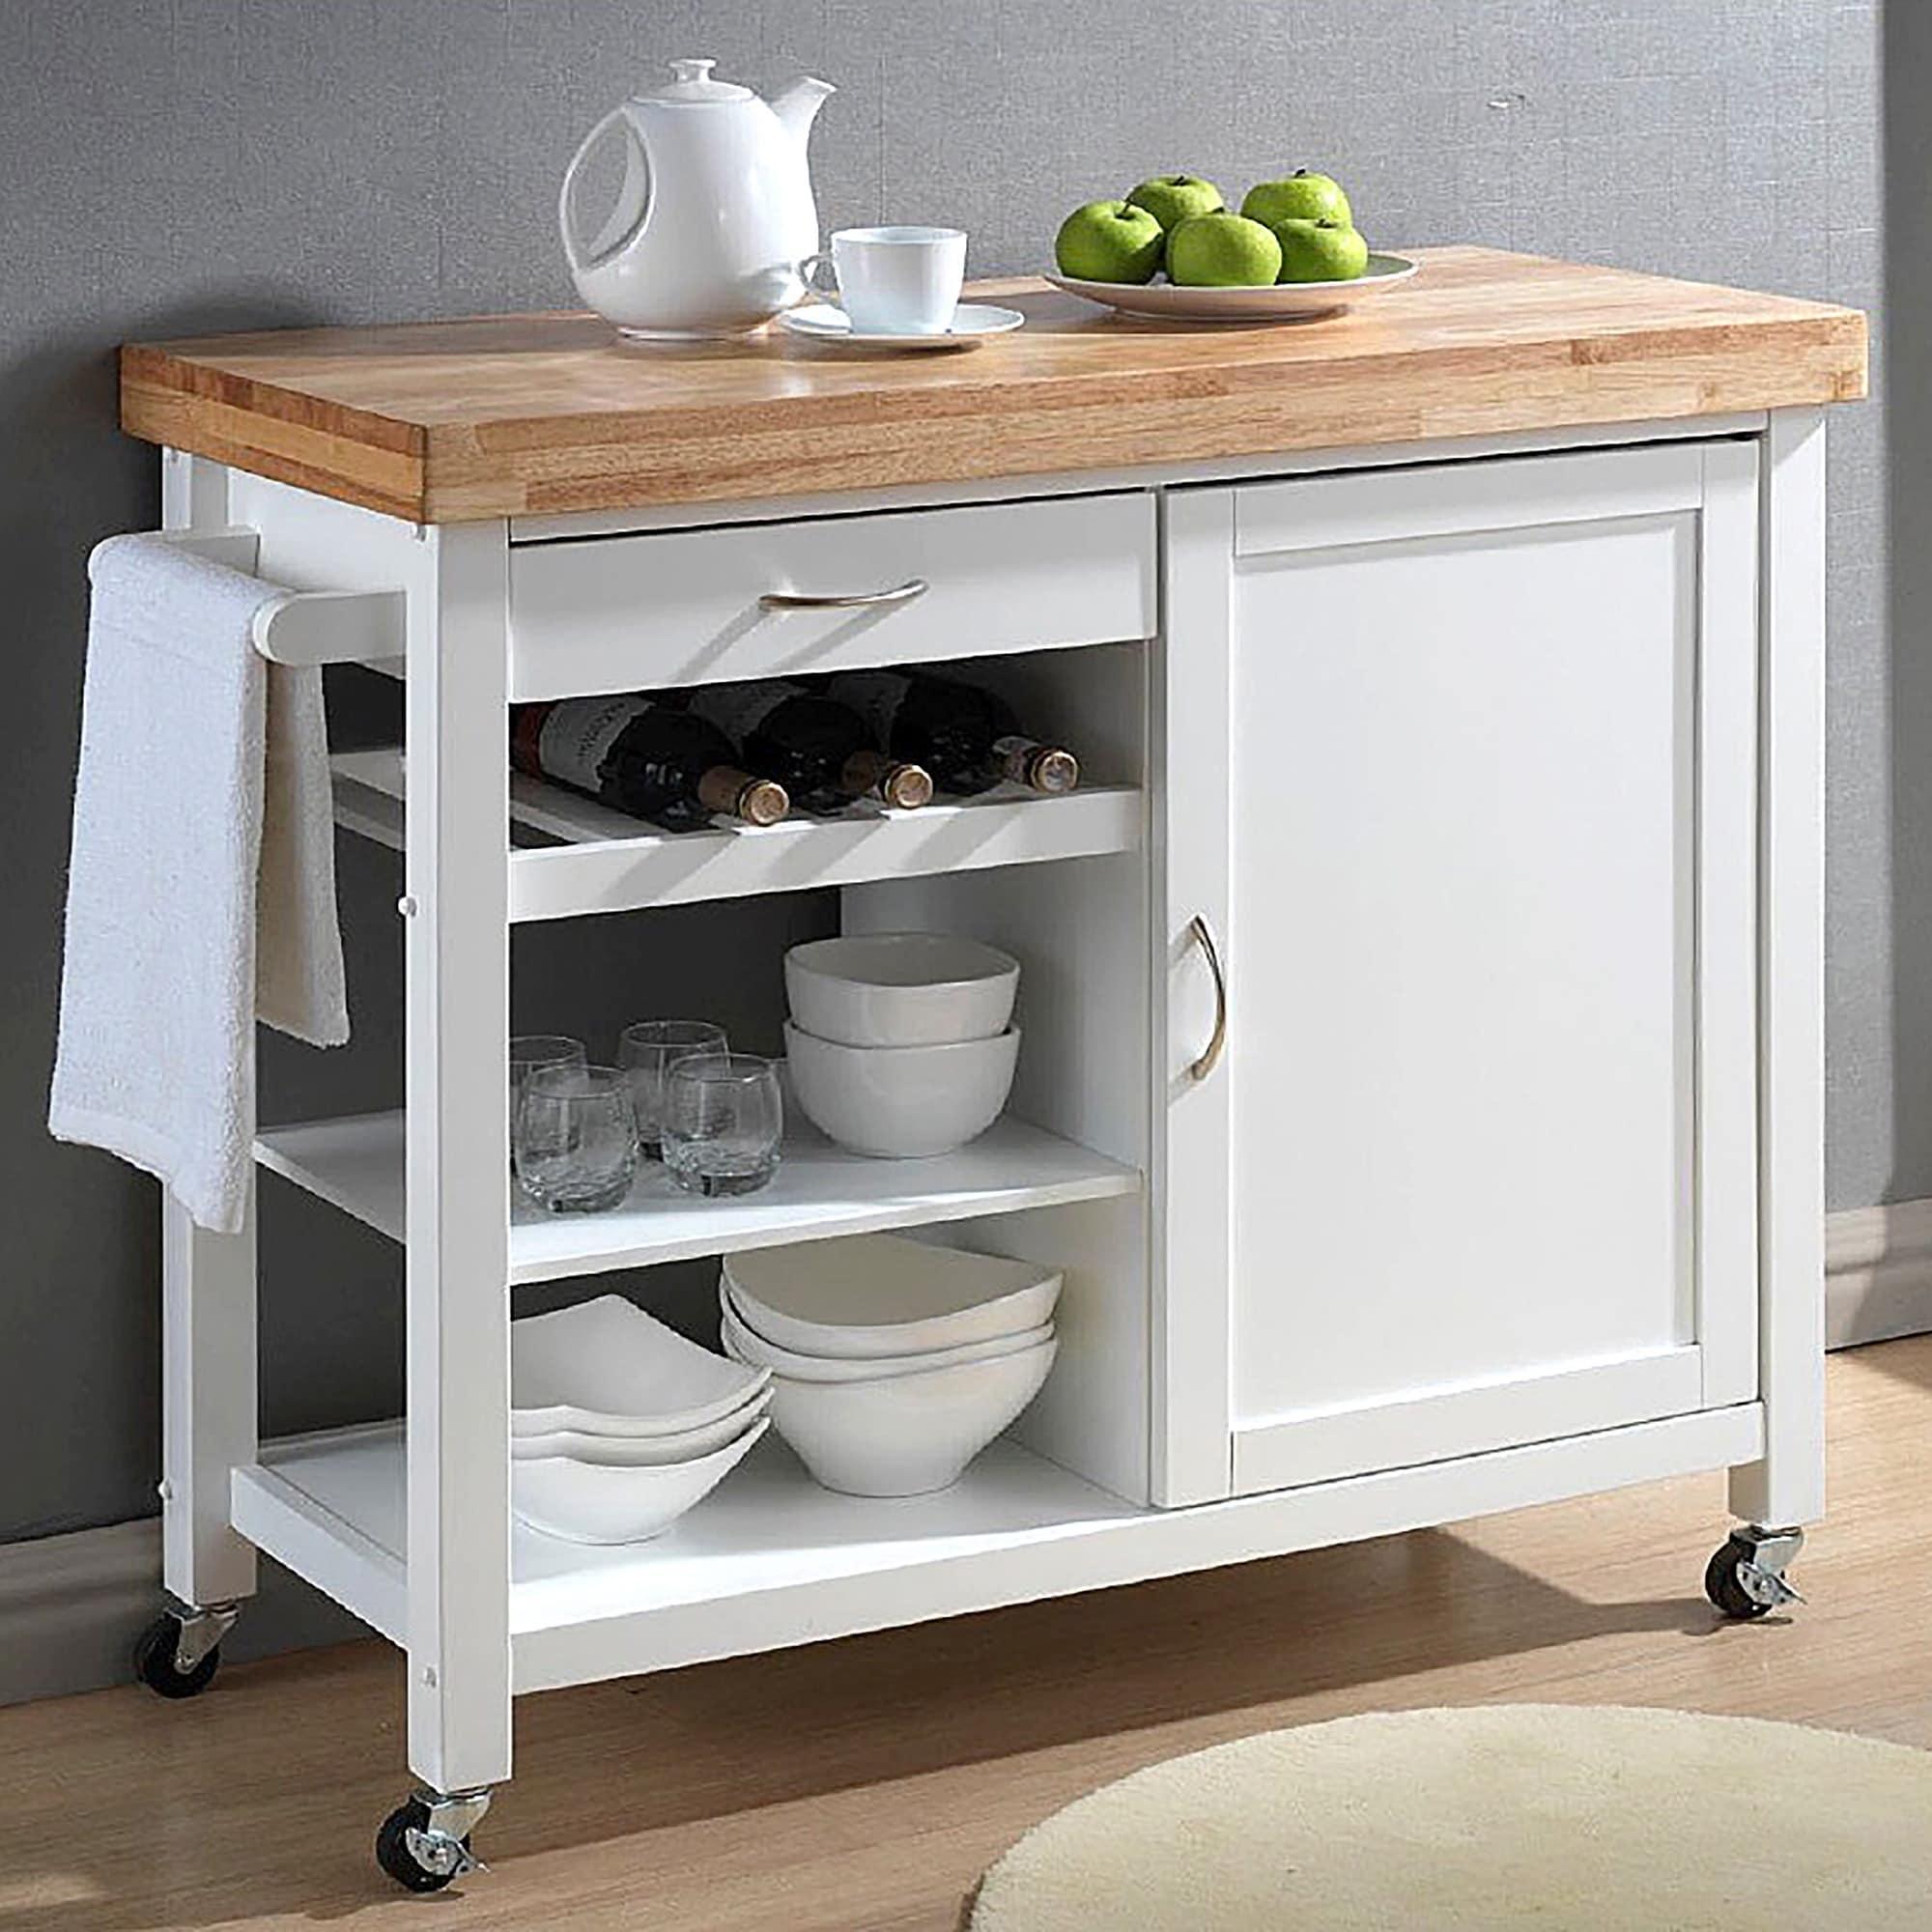 Denver white modern kitchen cart